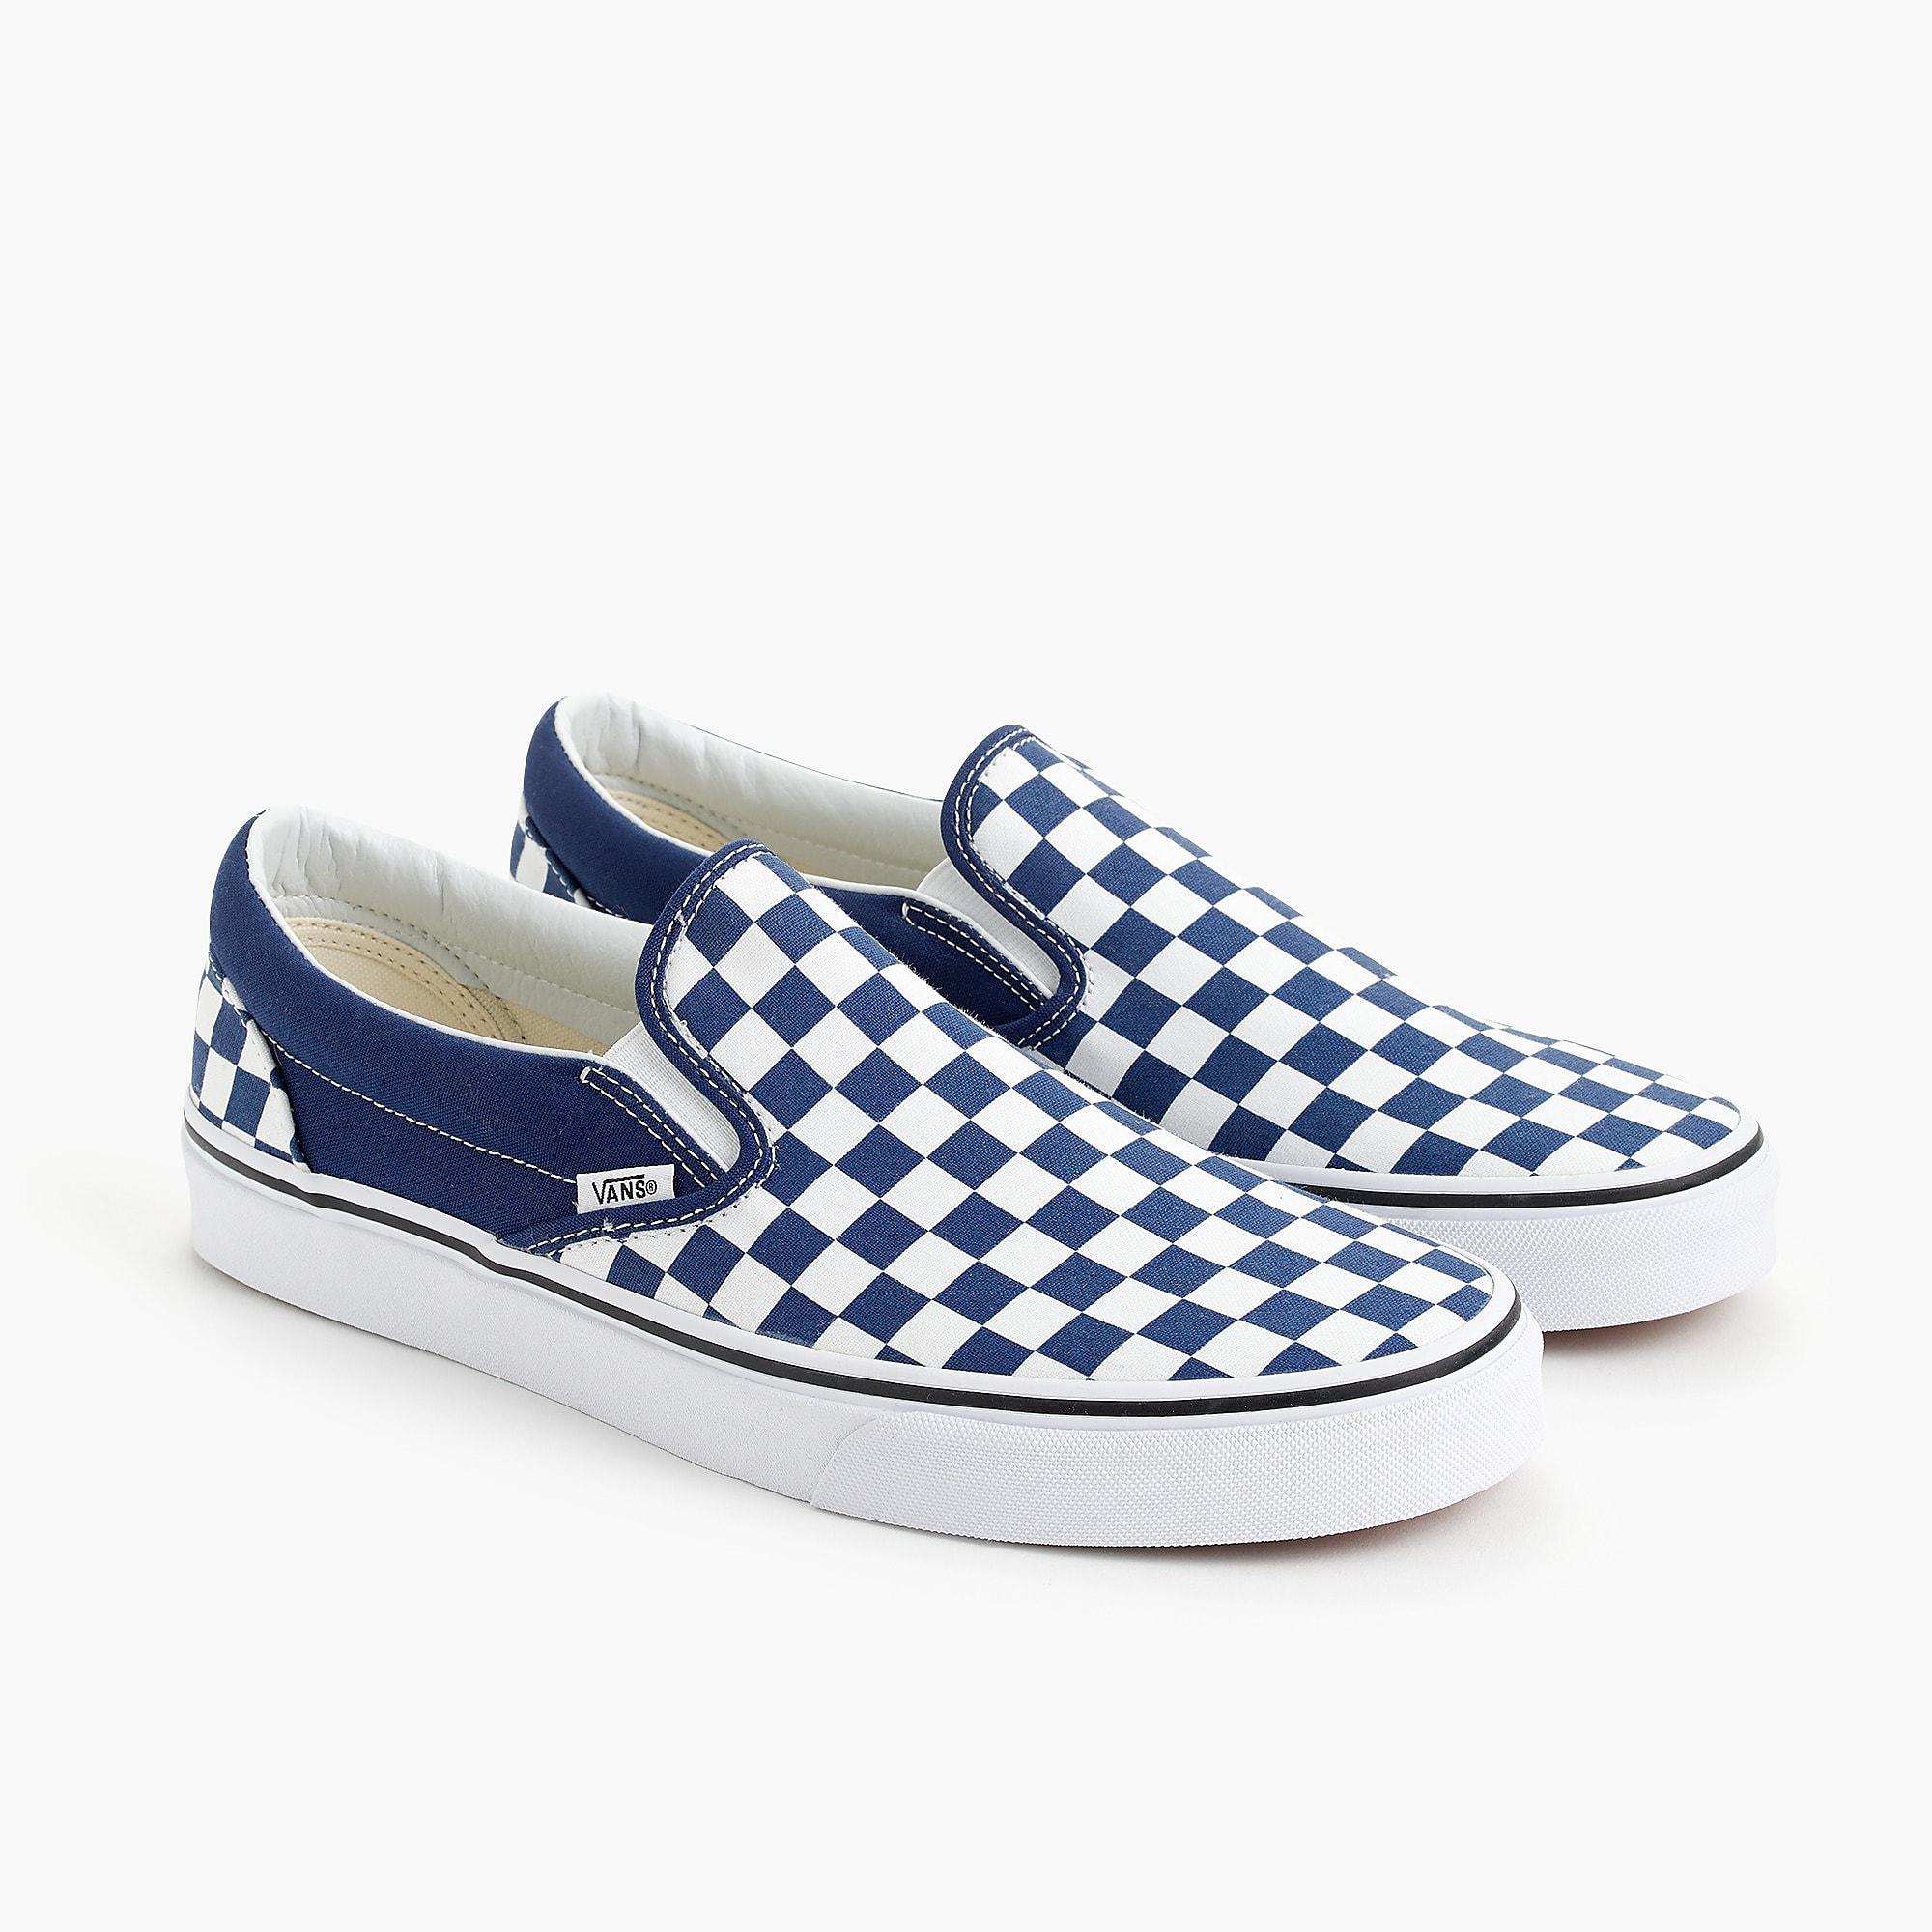 66198c499d15 Lyst - Vans Slip-on Sneakers In Blue Checkerboard in Blue for Men